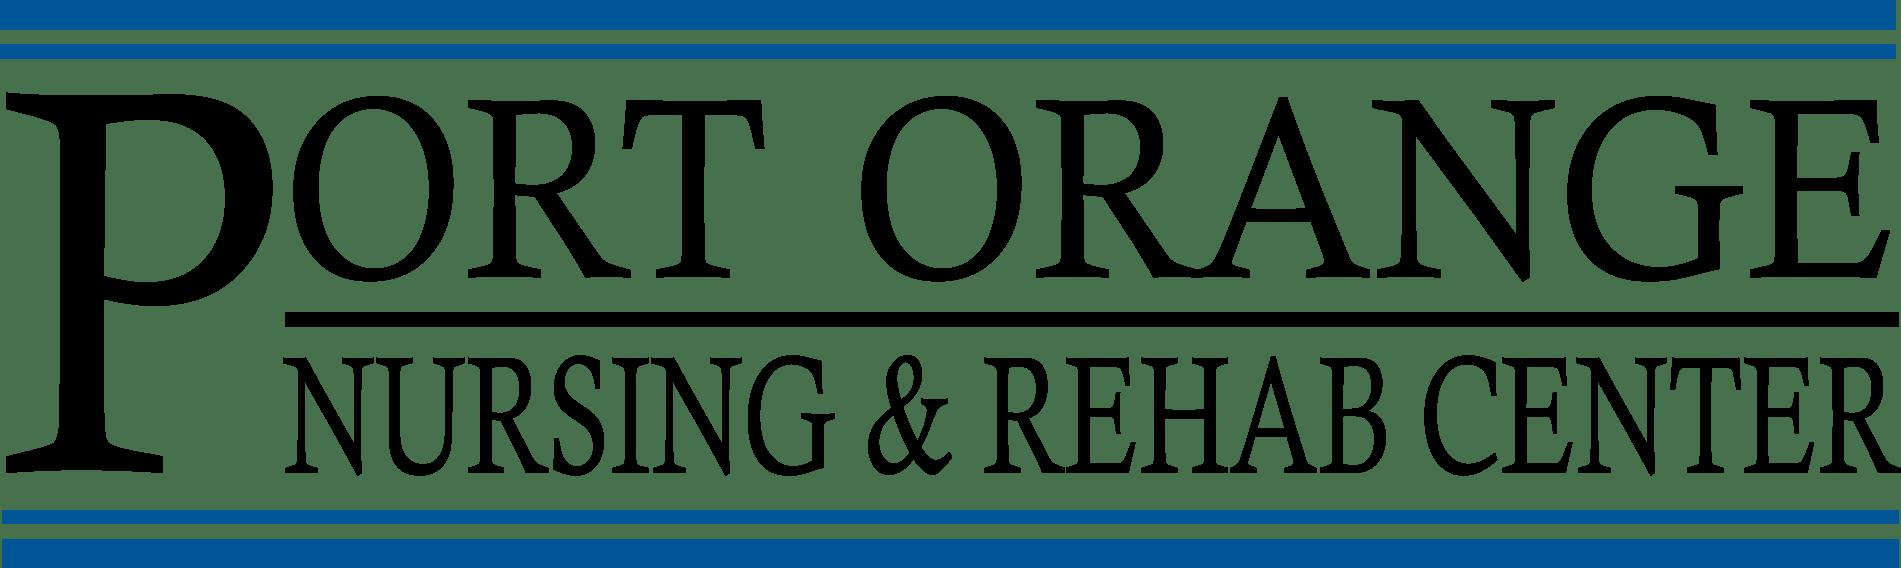 Port Orange Nursing and Rehab Center logo